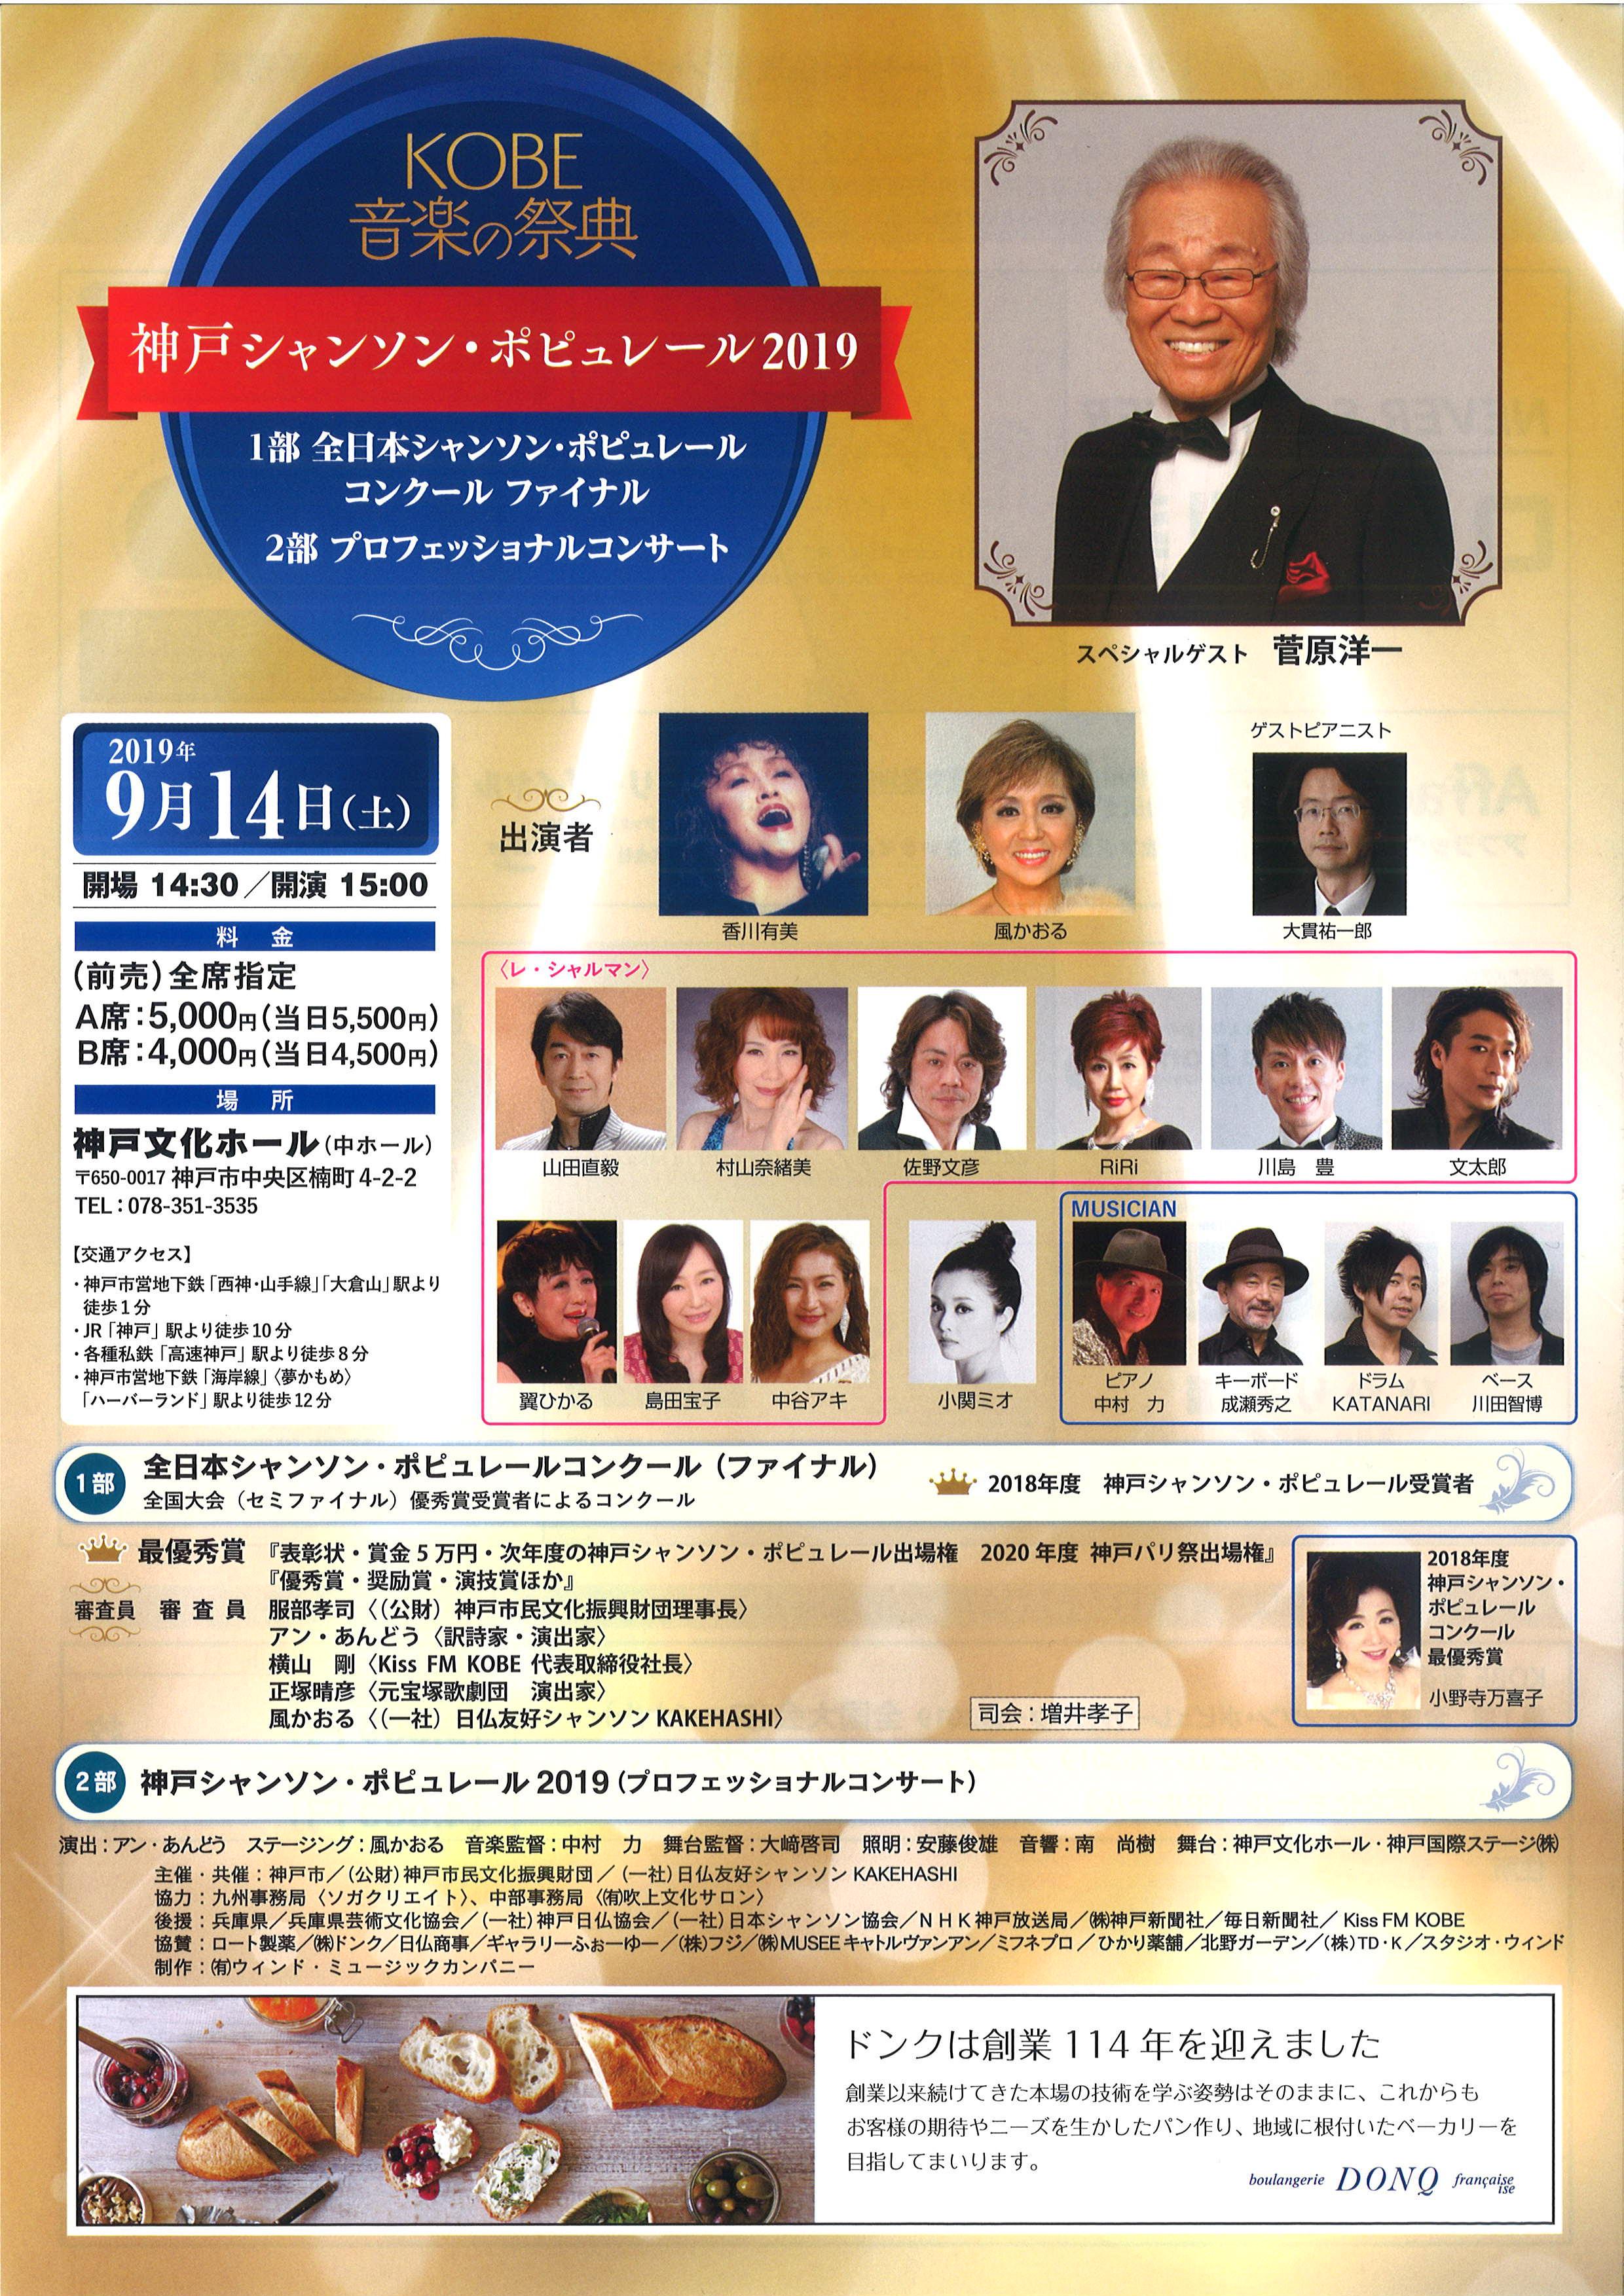 http://chanson-kakehashi.jp/top/wp-content/uploads/2019/06/20190605100648_00001.jpg